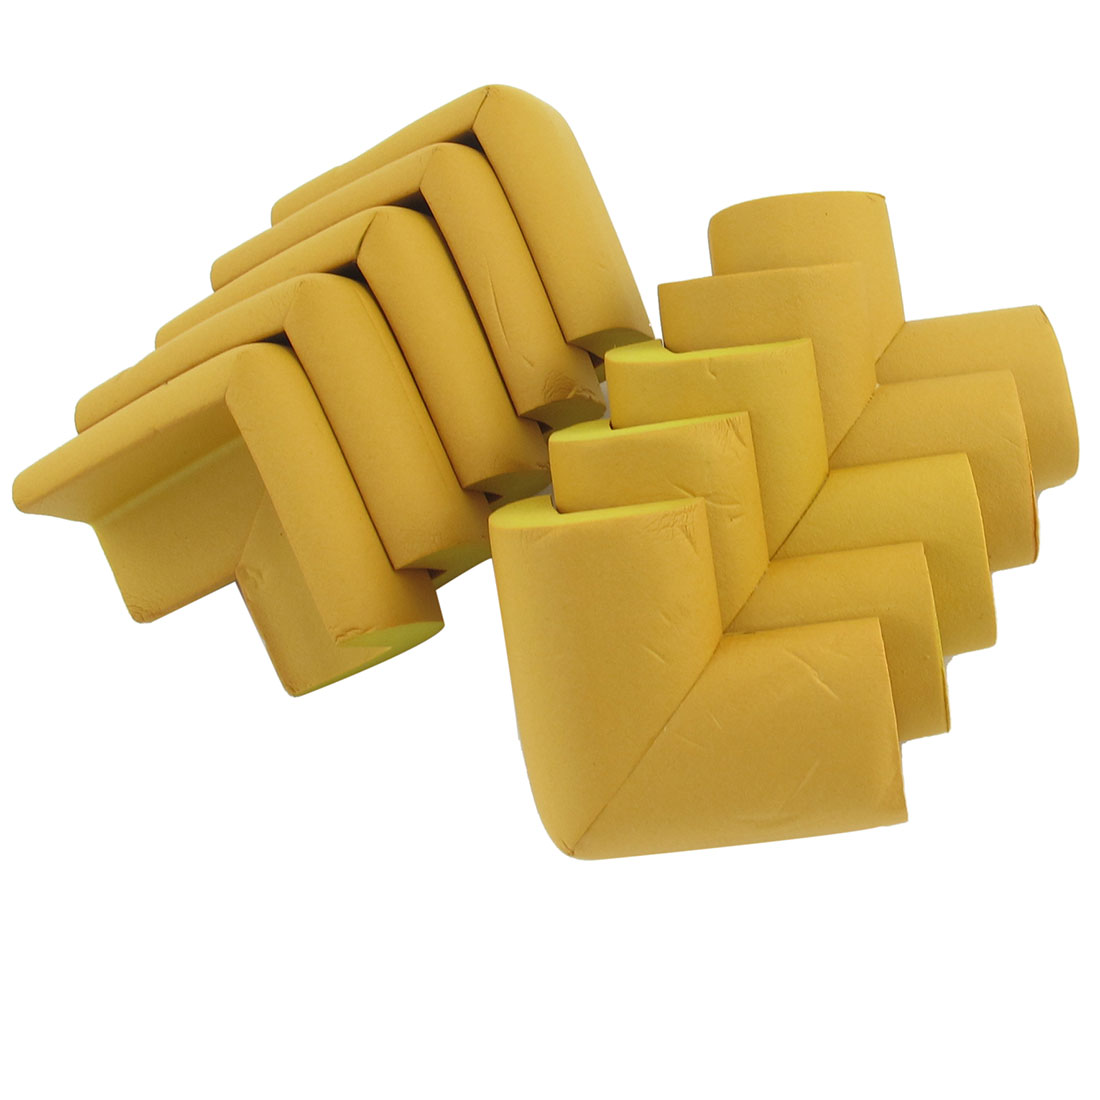 10 Pcs Khaki Foam Worktop Desk Table Pads Corner Protective Cushion + Stickers